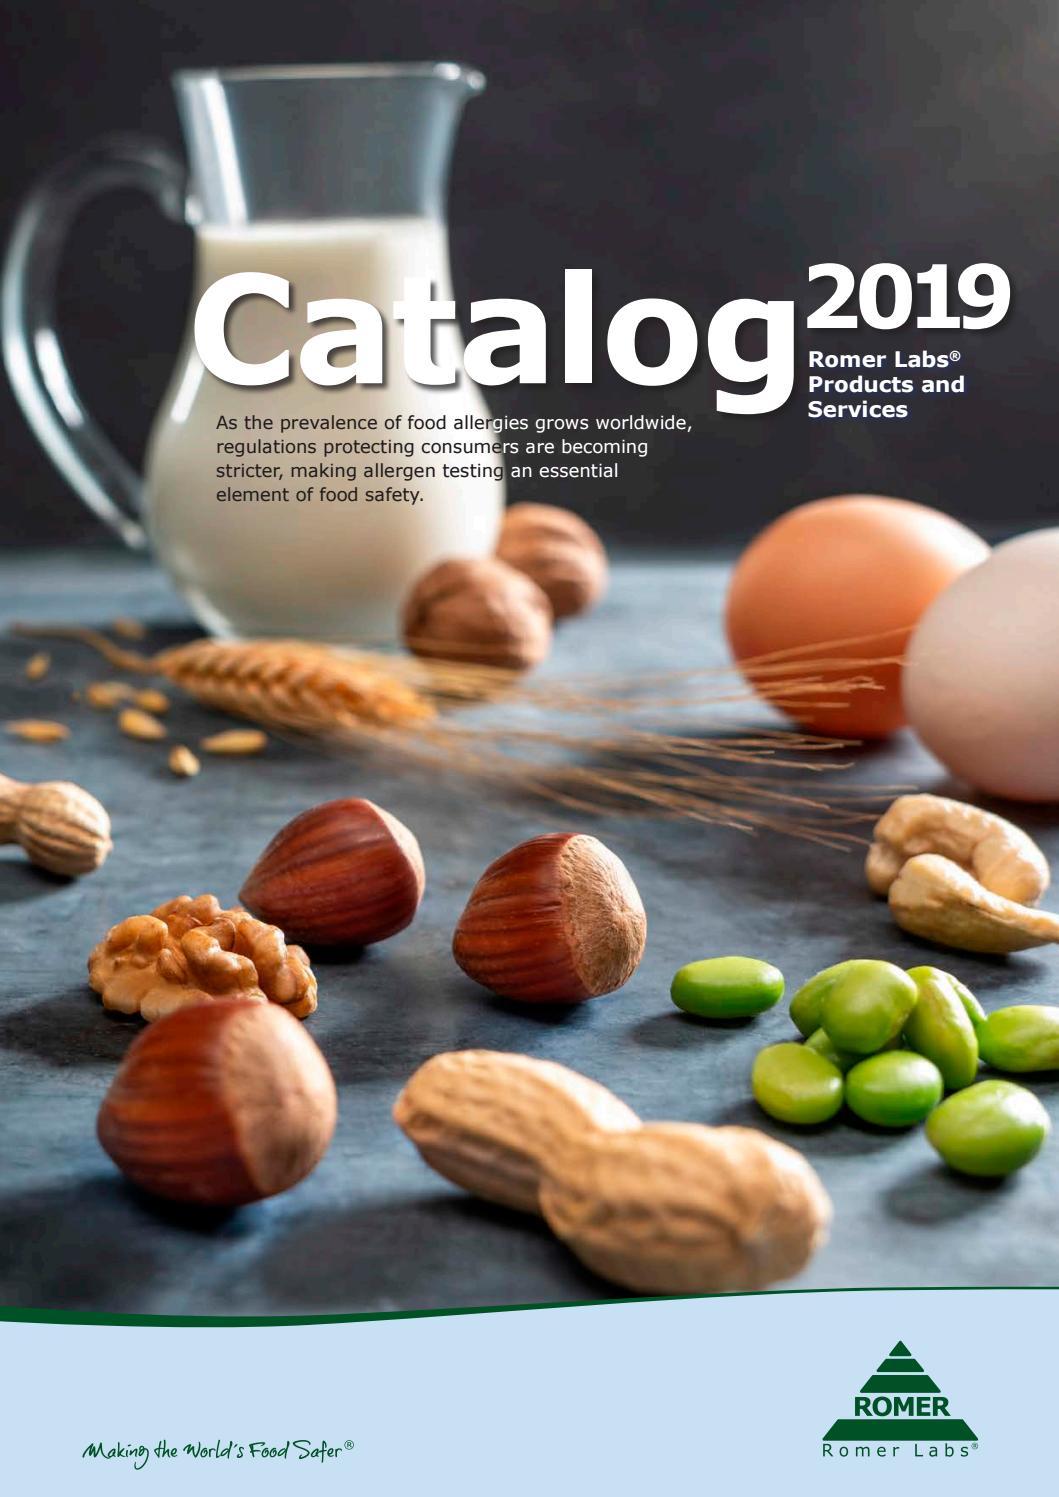 Romer Labs Catalog 2019 by romerlabs - issuu